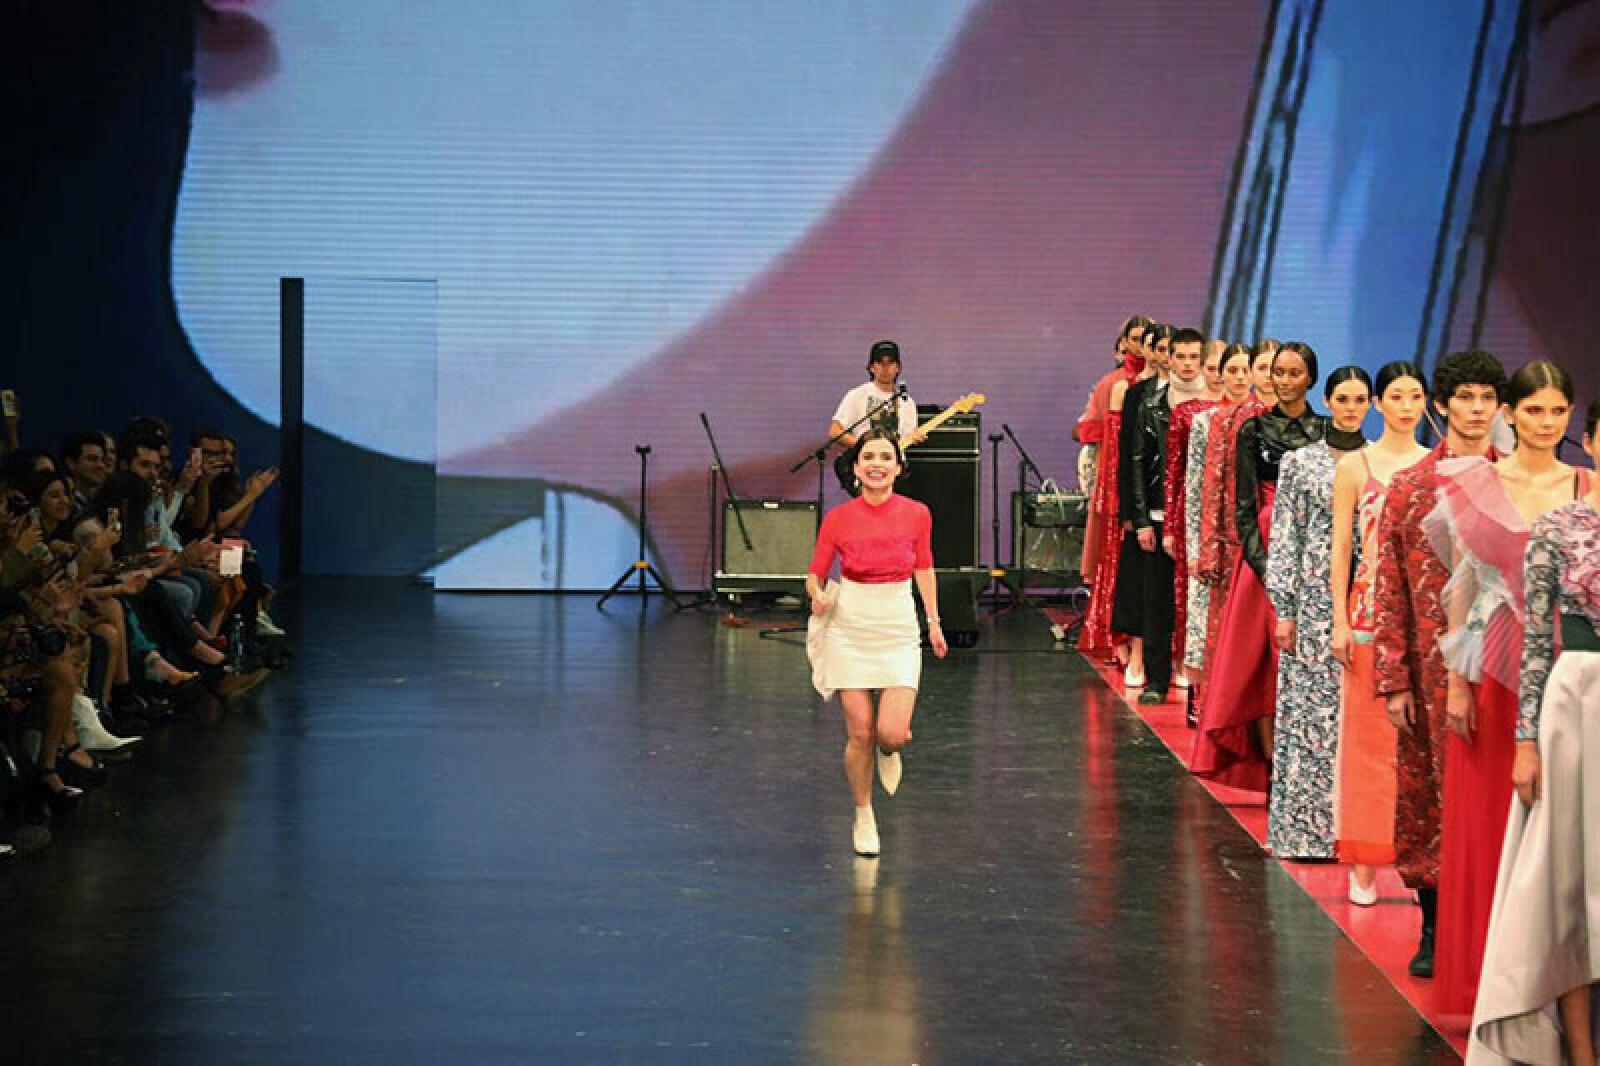 Desfile-Alexia-Ulibarri-MBFWM-Fashion-Designer-on-the-catwalk